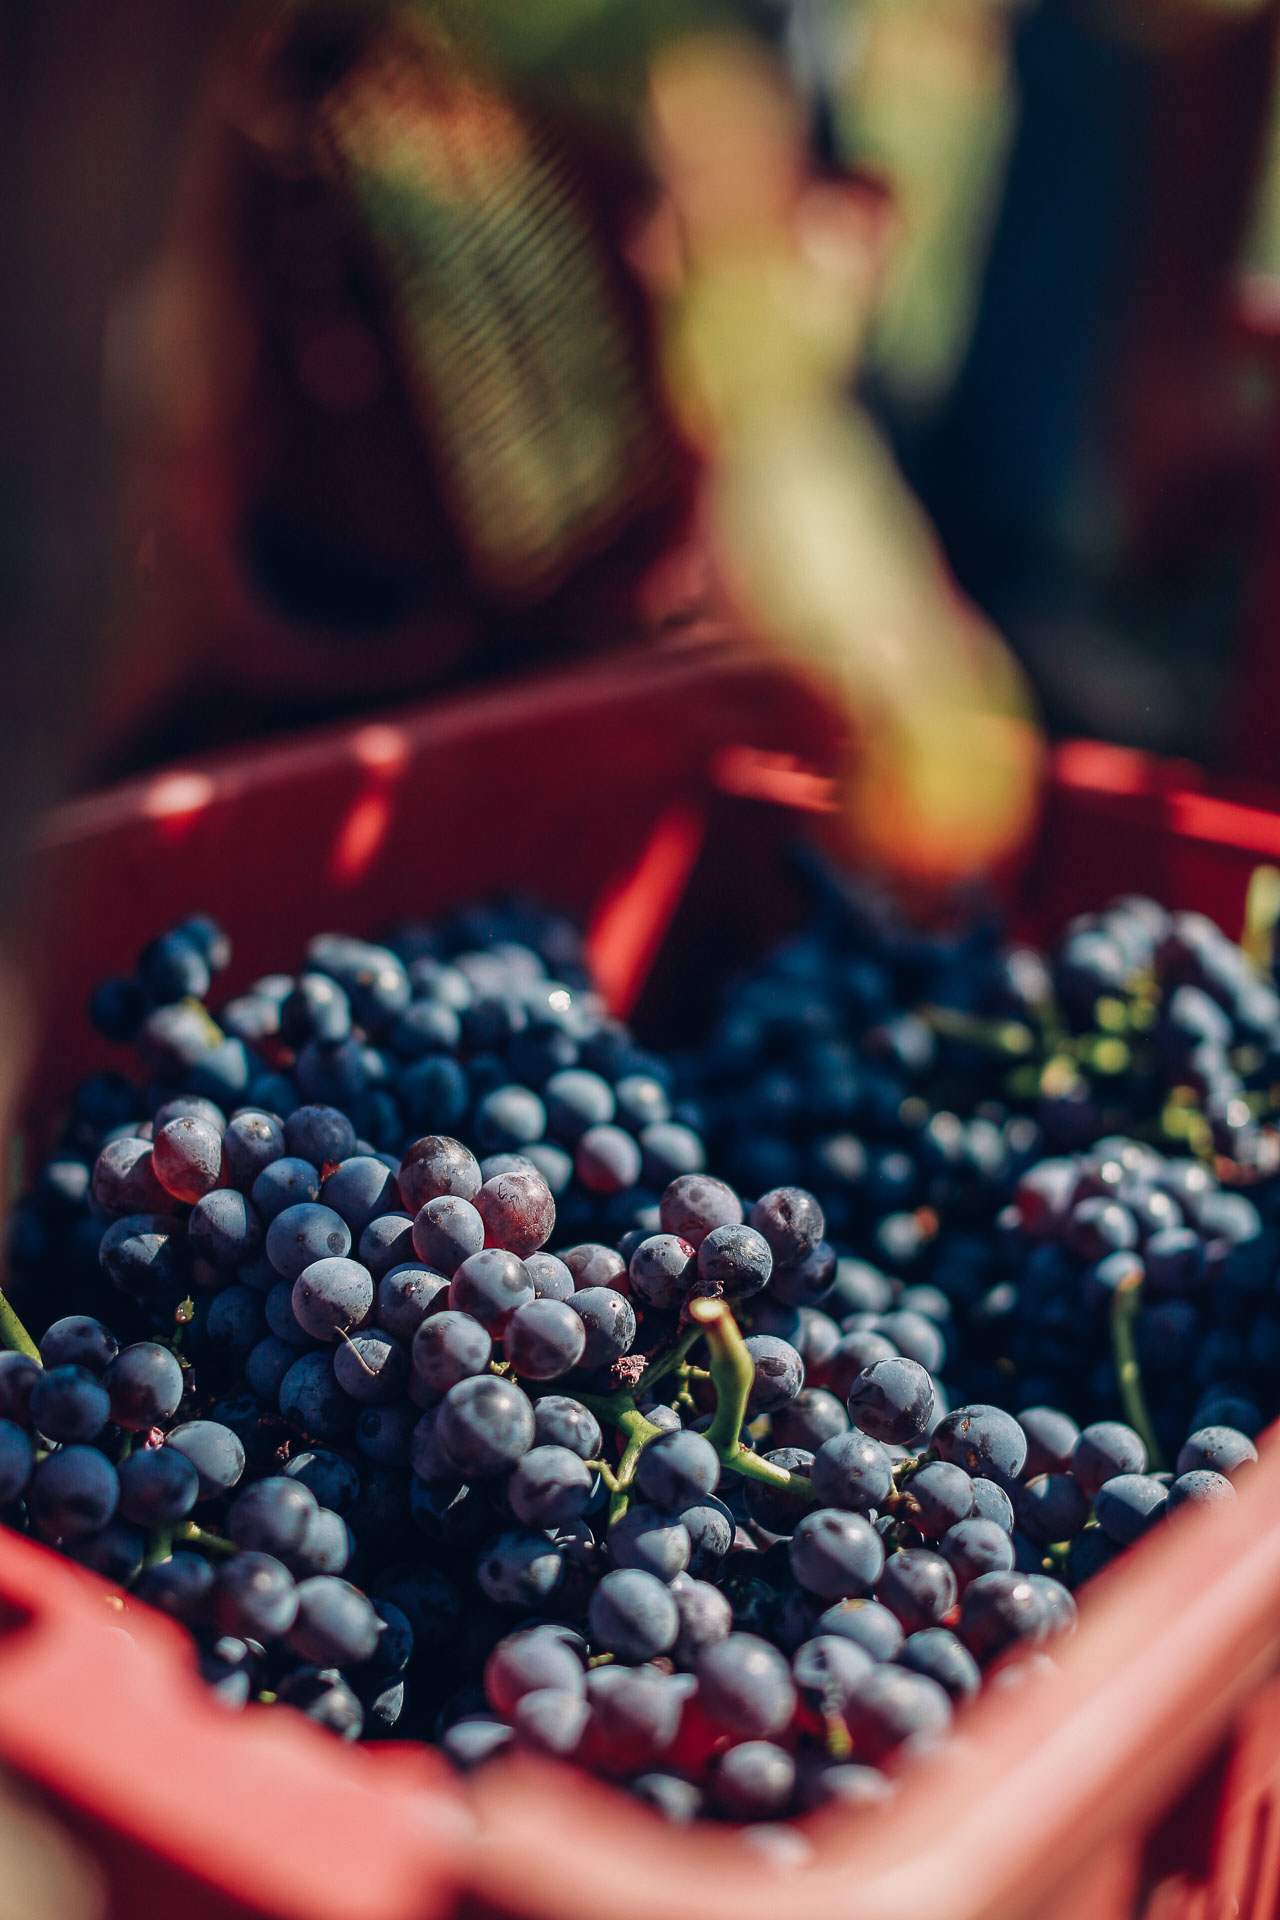 037-Sauro-maule-wineyards-organic-harvest-2016-_RUI7432_p_Lr_web_HD